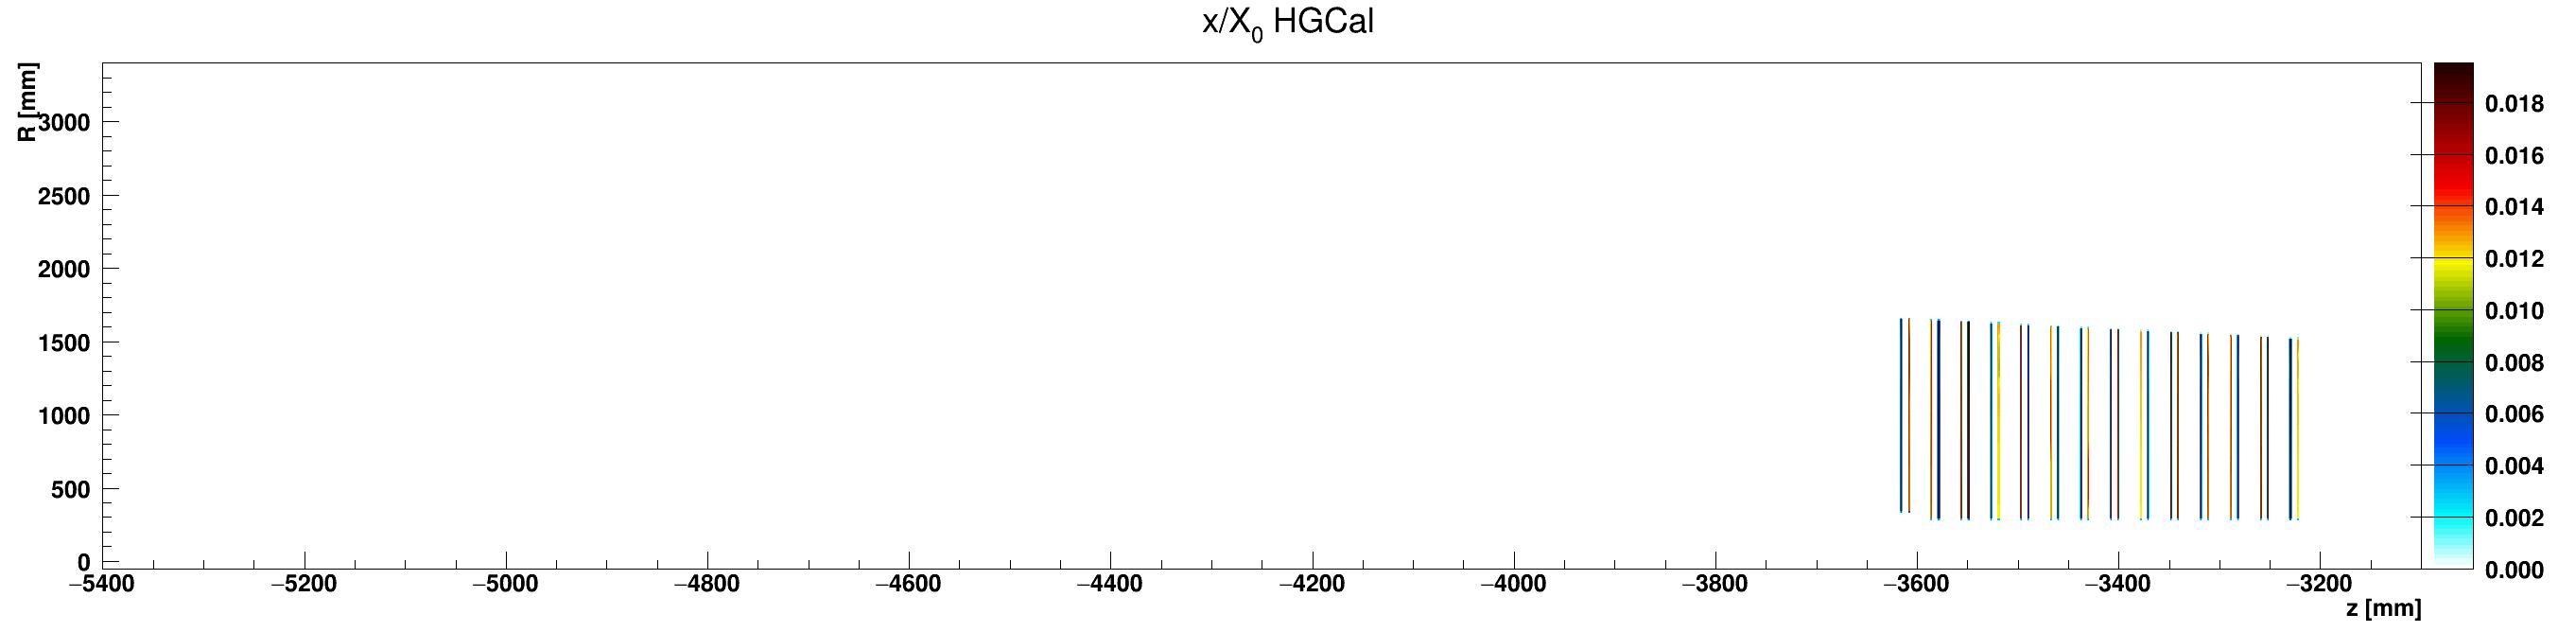 HGCal_x_vs_z_vs_RlocWCu_ZminusZoom.png